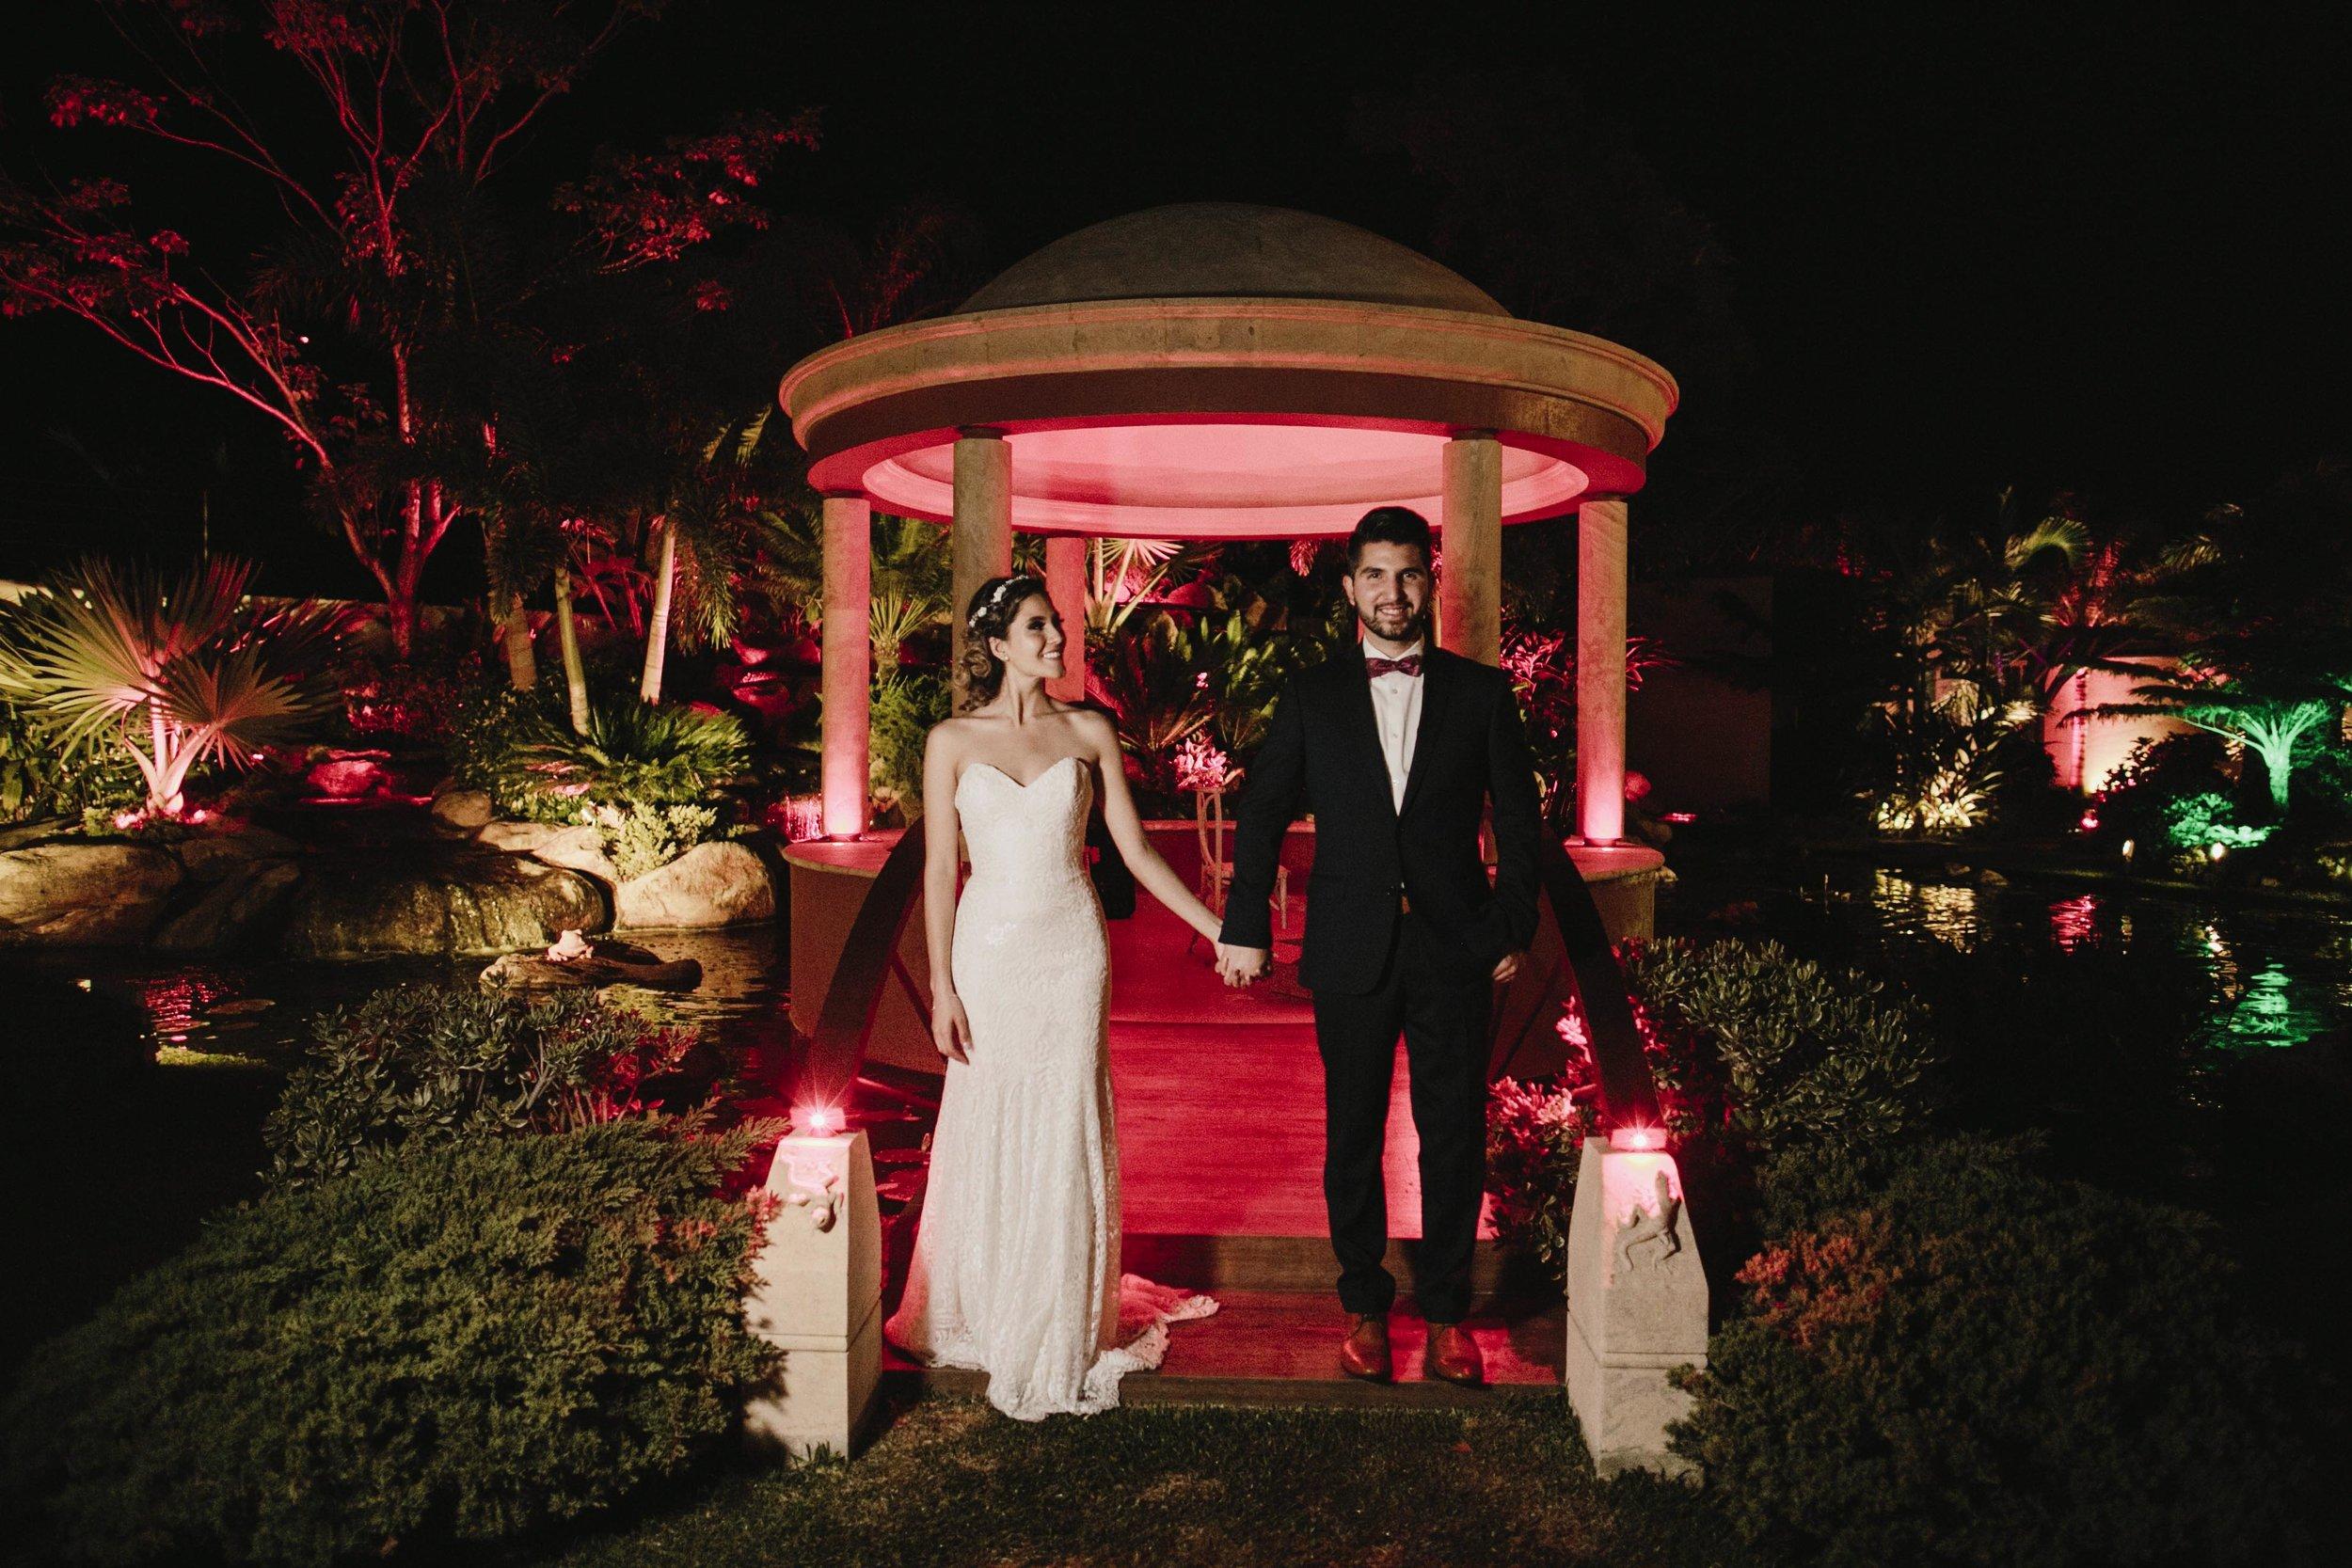 alfonso_flores_destination_wedding_photography_jardin_amarello_cuernavaca11.jpg